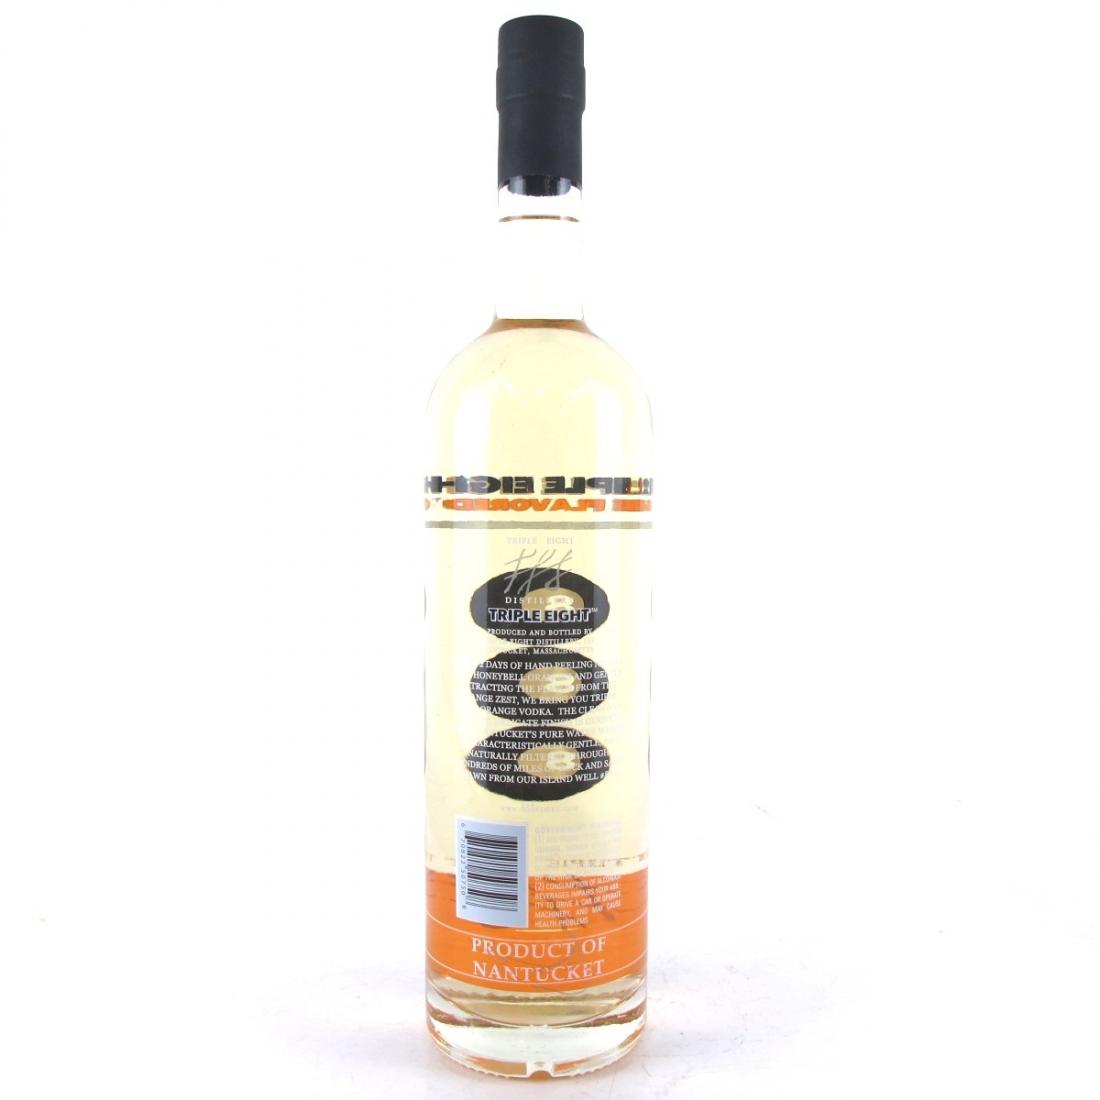 Triple 8 Orange Flavoured Nantucket Vodka